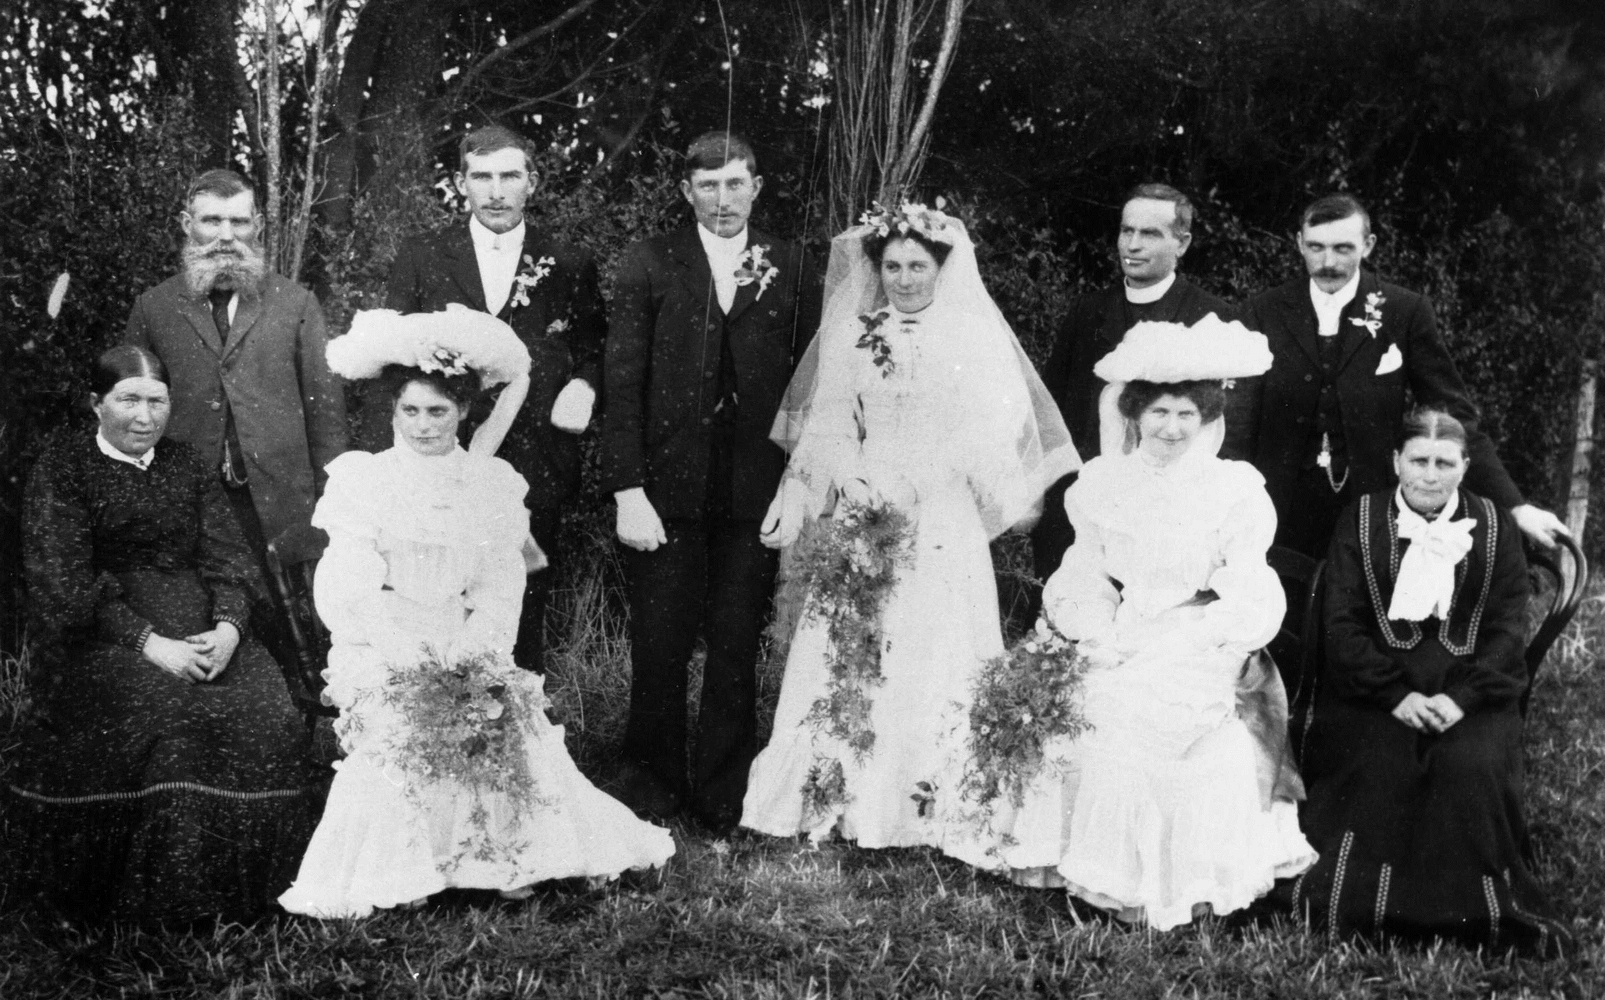 Black &  white photograph of the main wedding party taken in a garden.